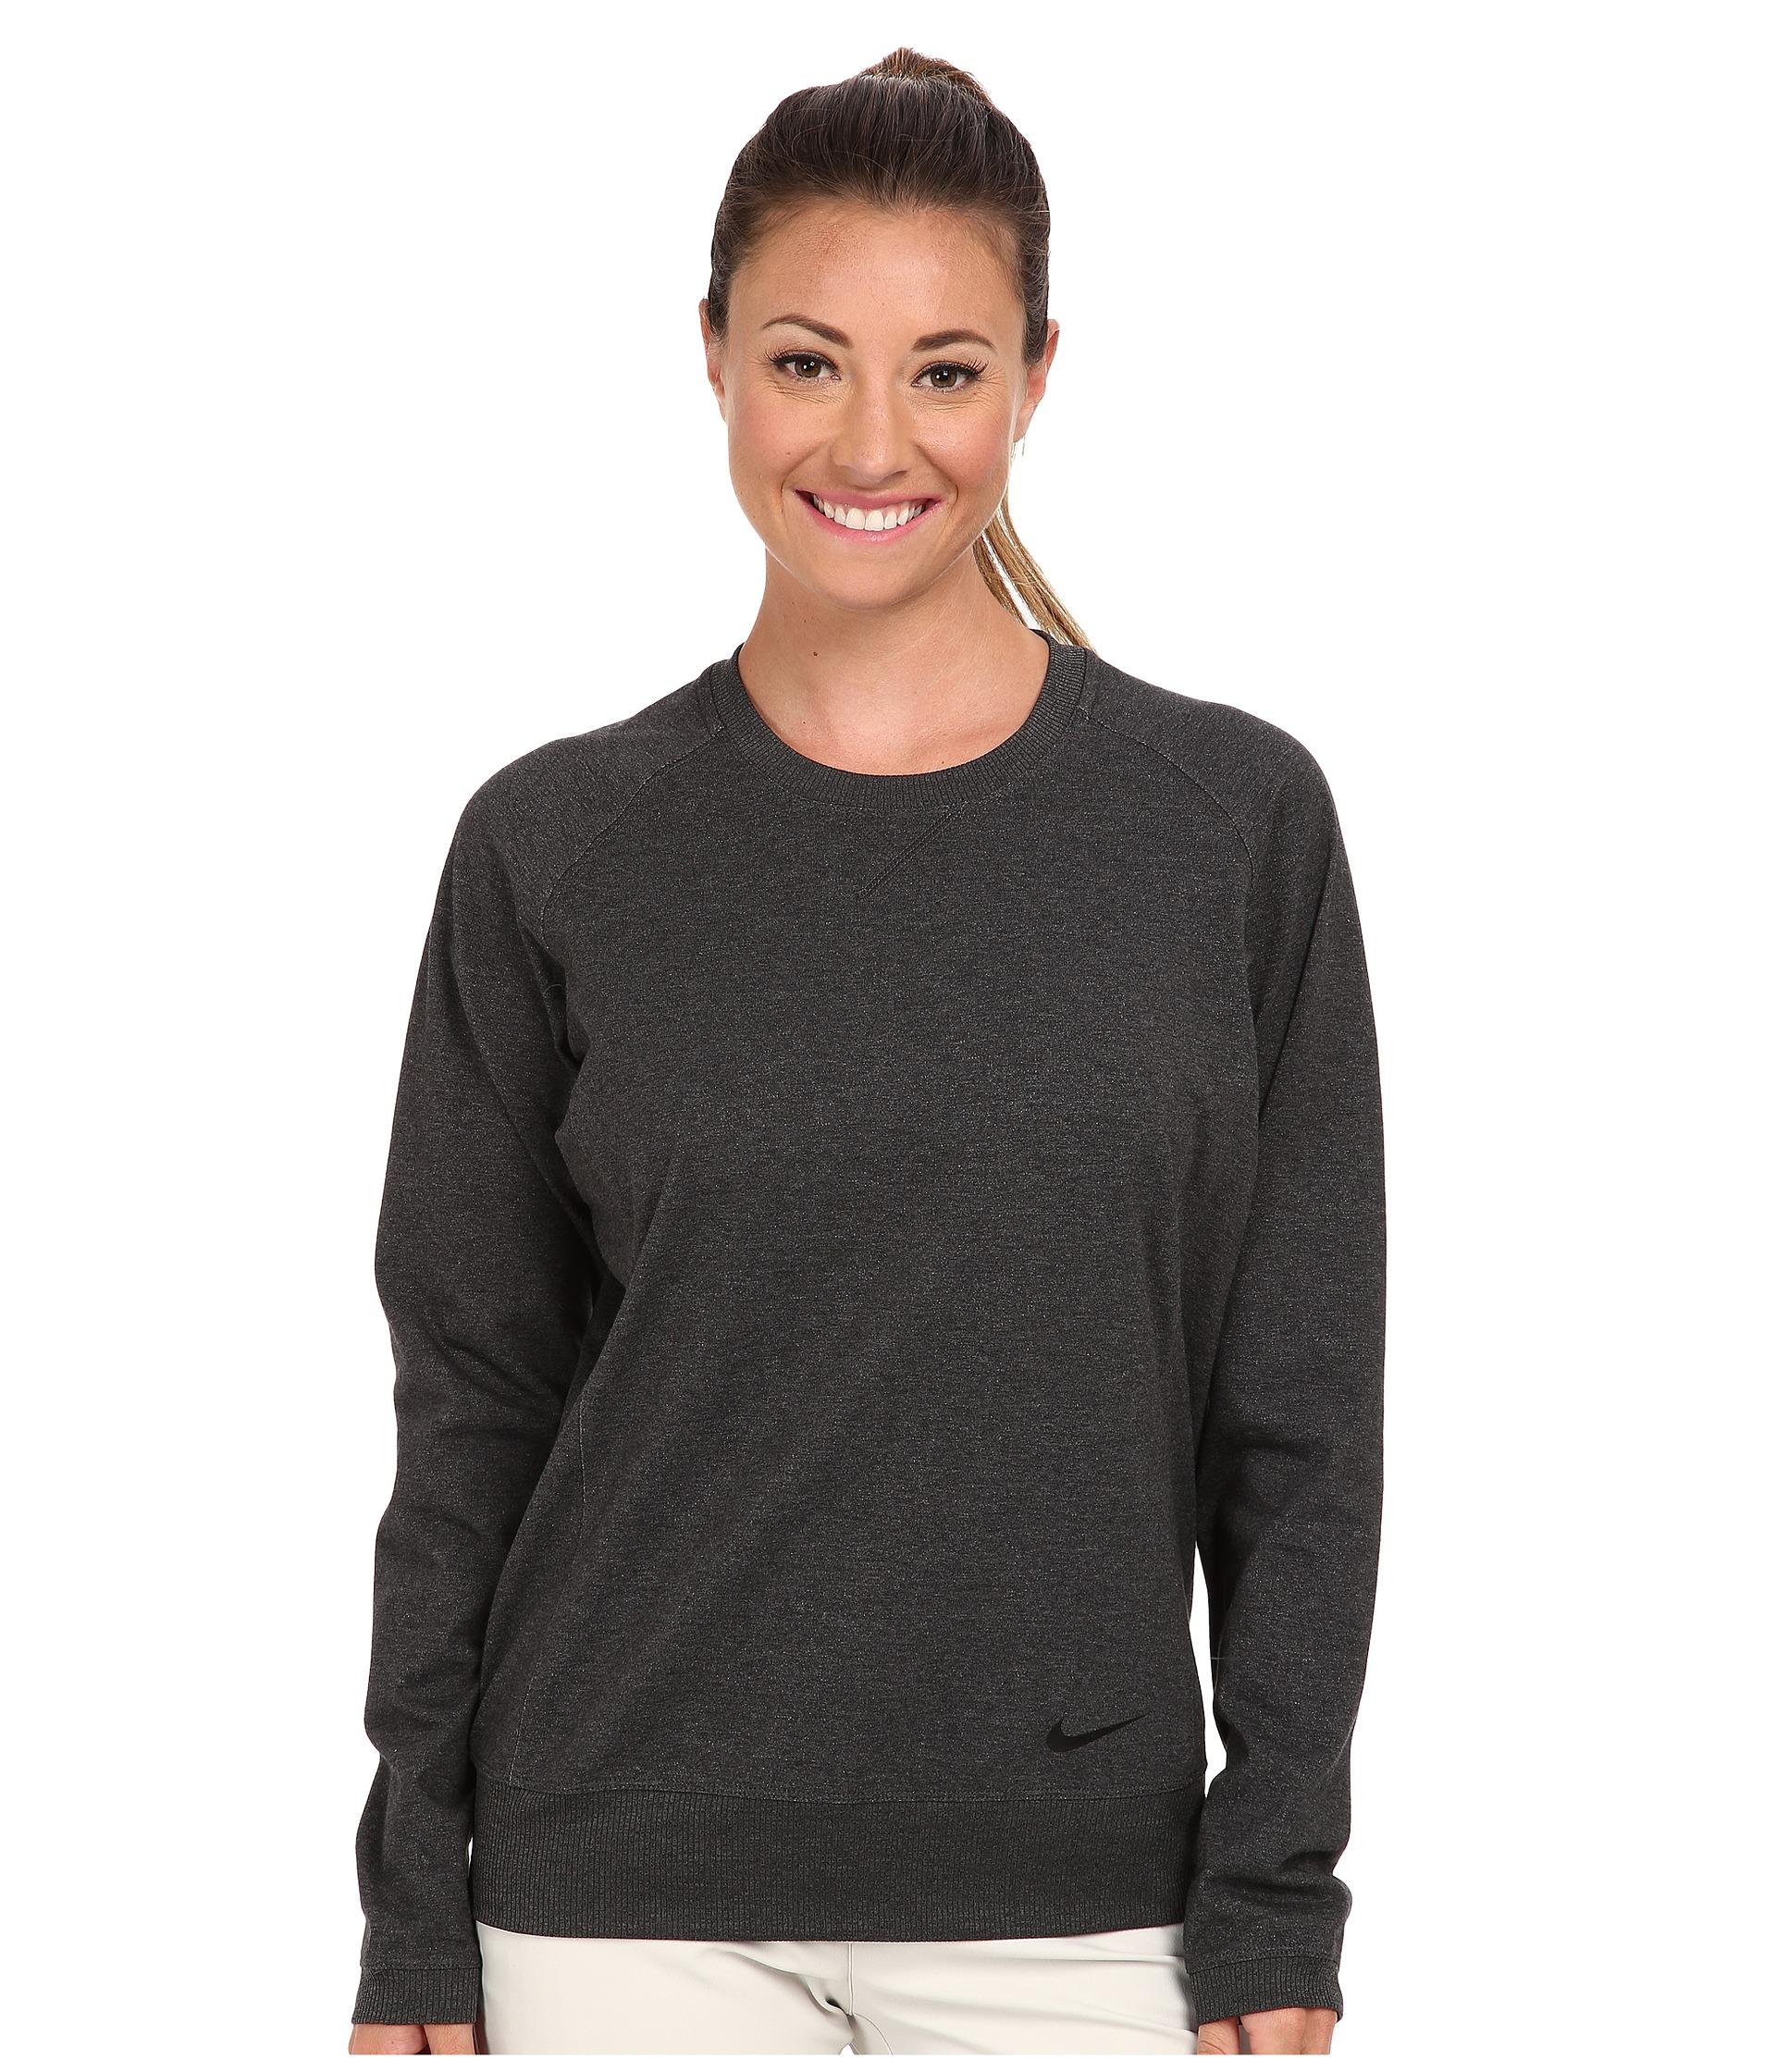 timberland femme paris - Nike, Hoodies \u0026amp; Sweatshirts, Women at 6pm.com